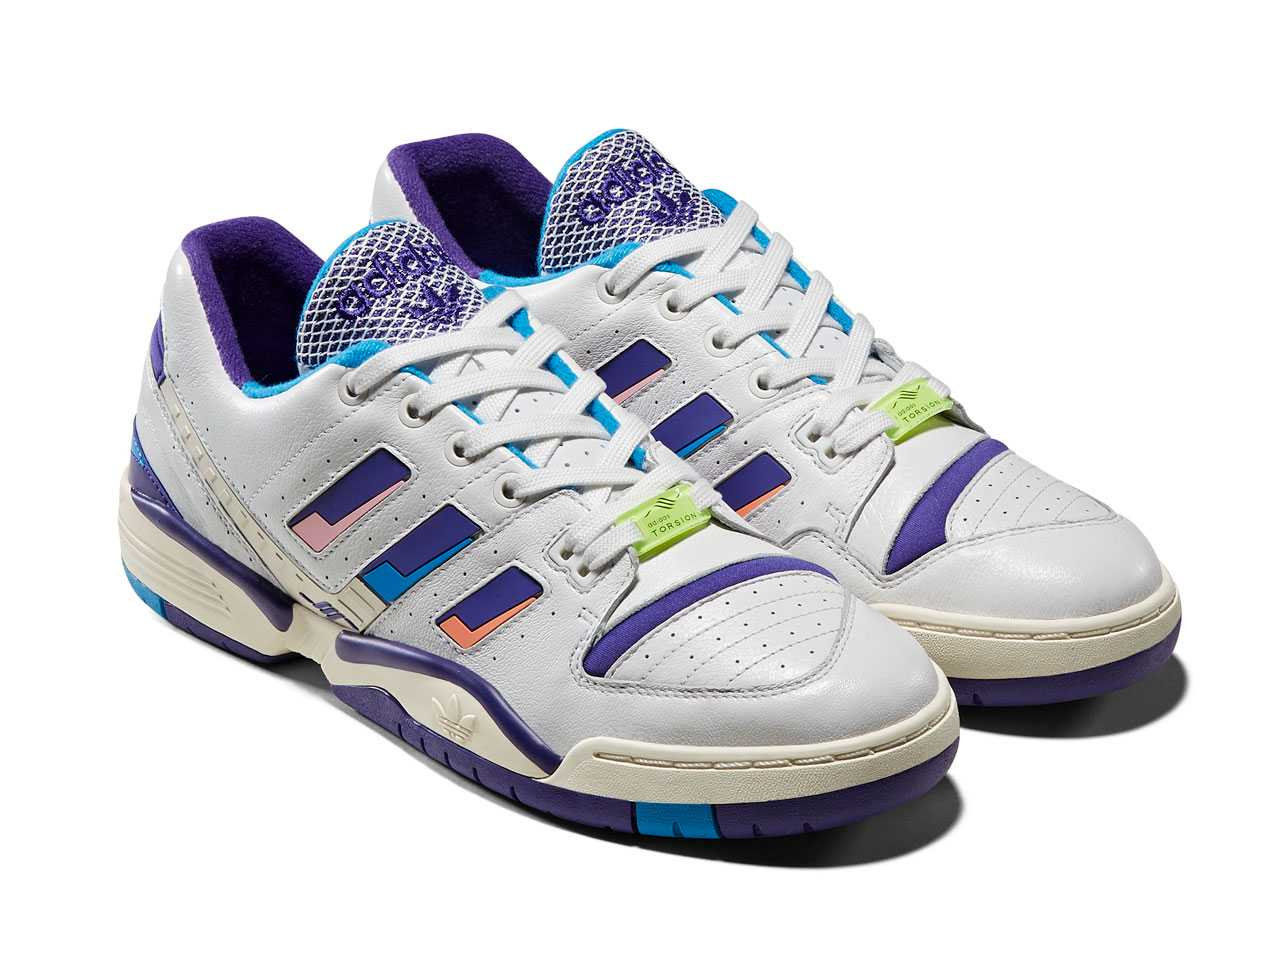 adidas Consortium TORSION EDBERG COMP - CRAYON WHITE/BRIGHT BLUE